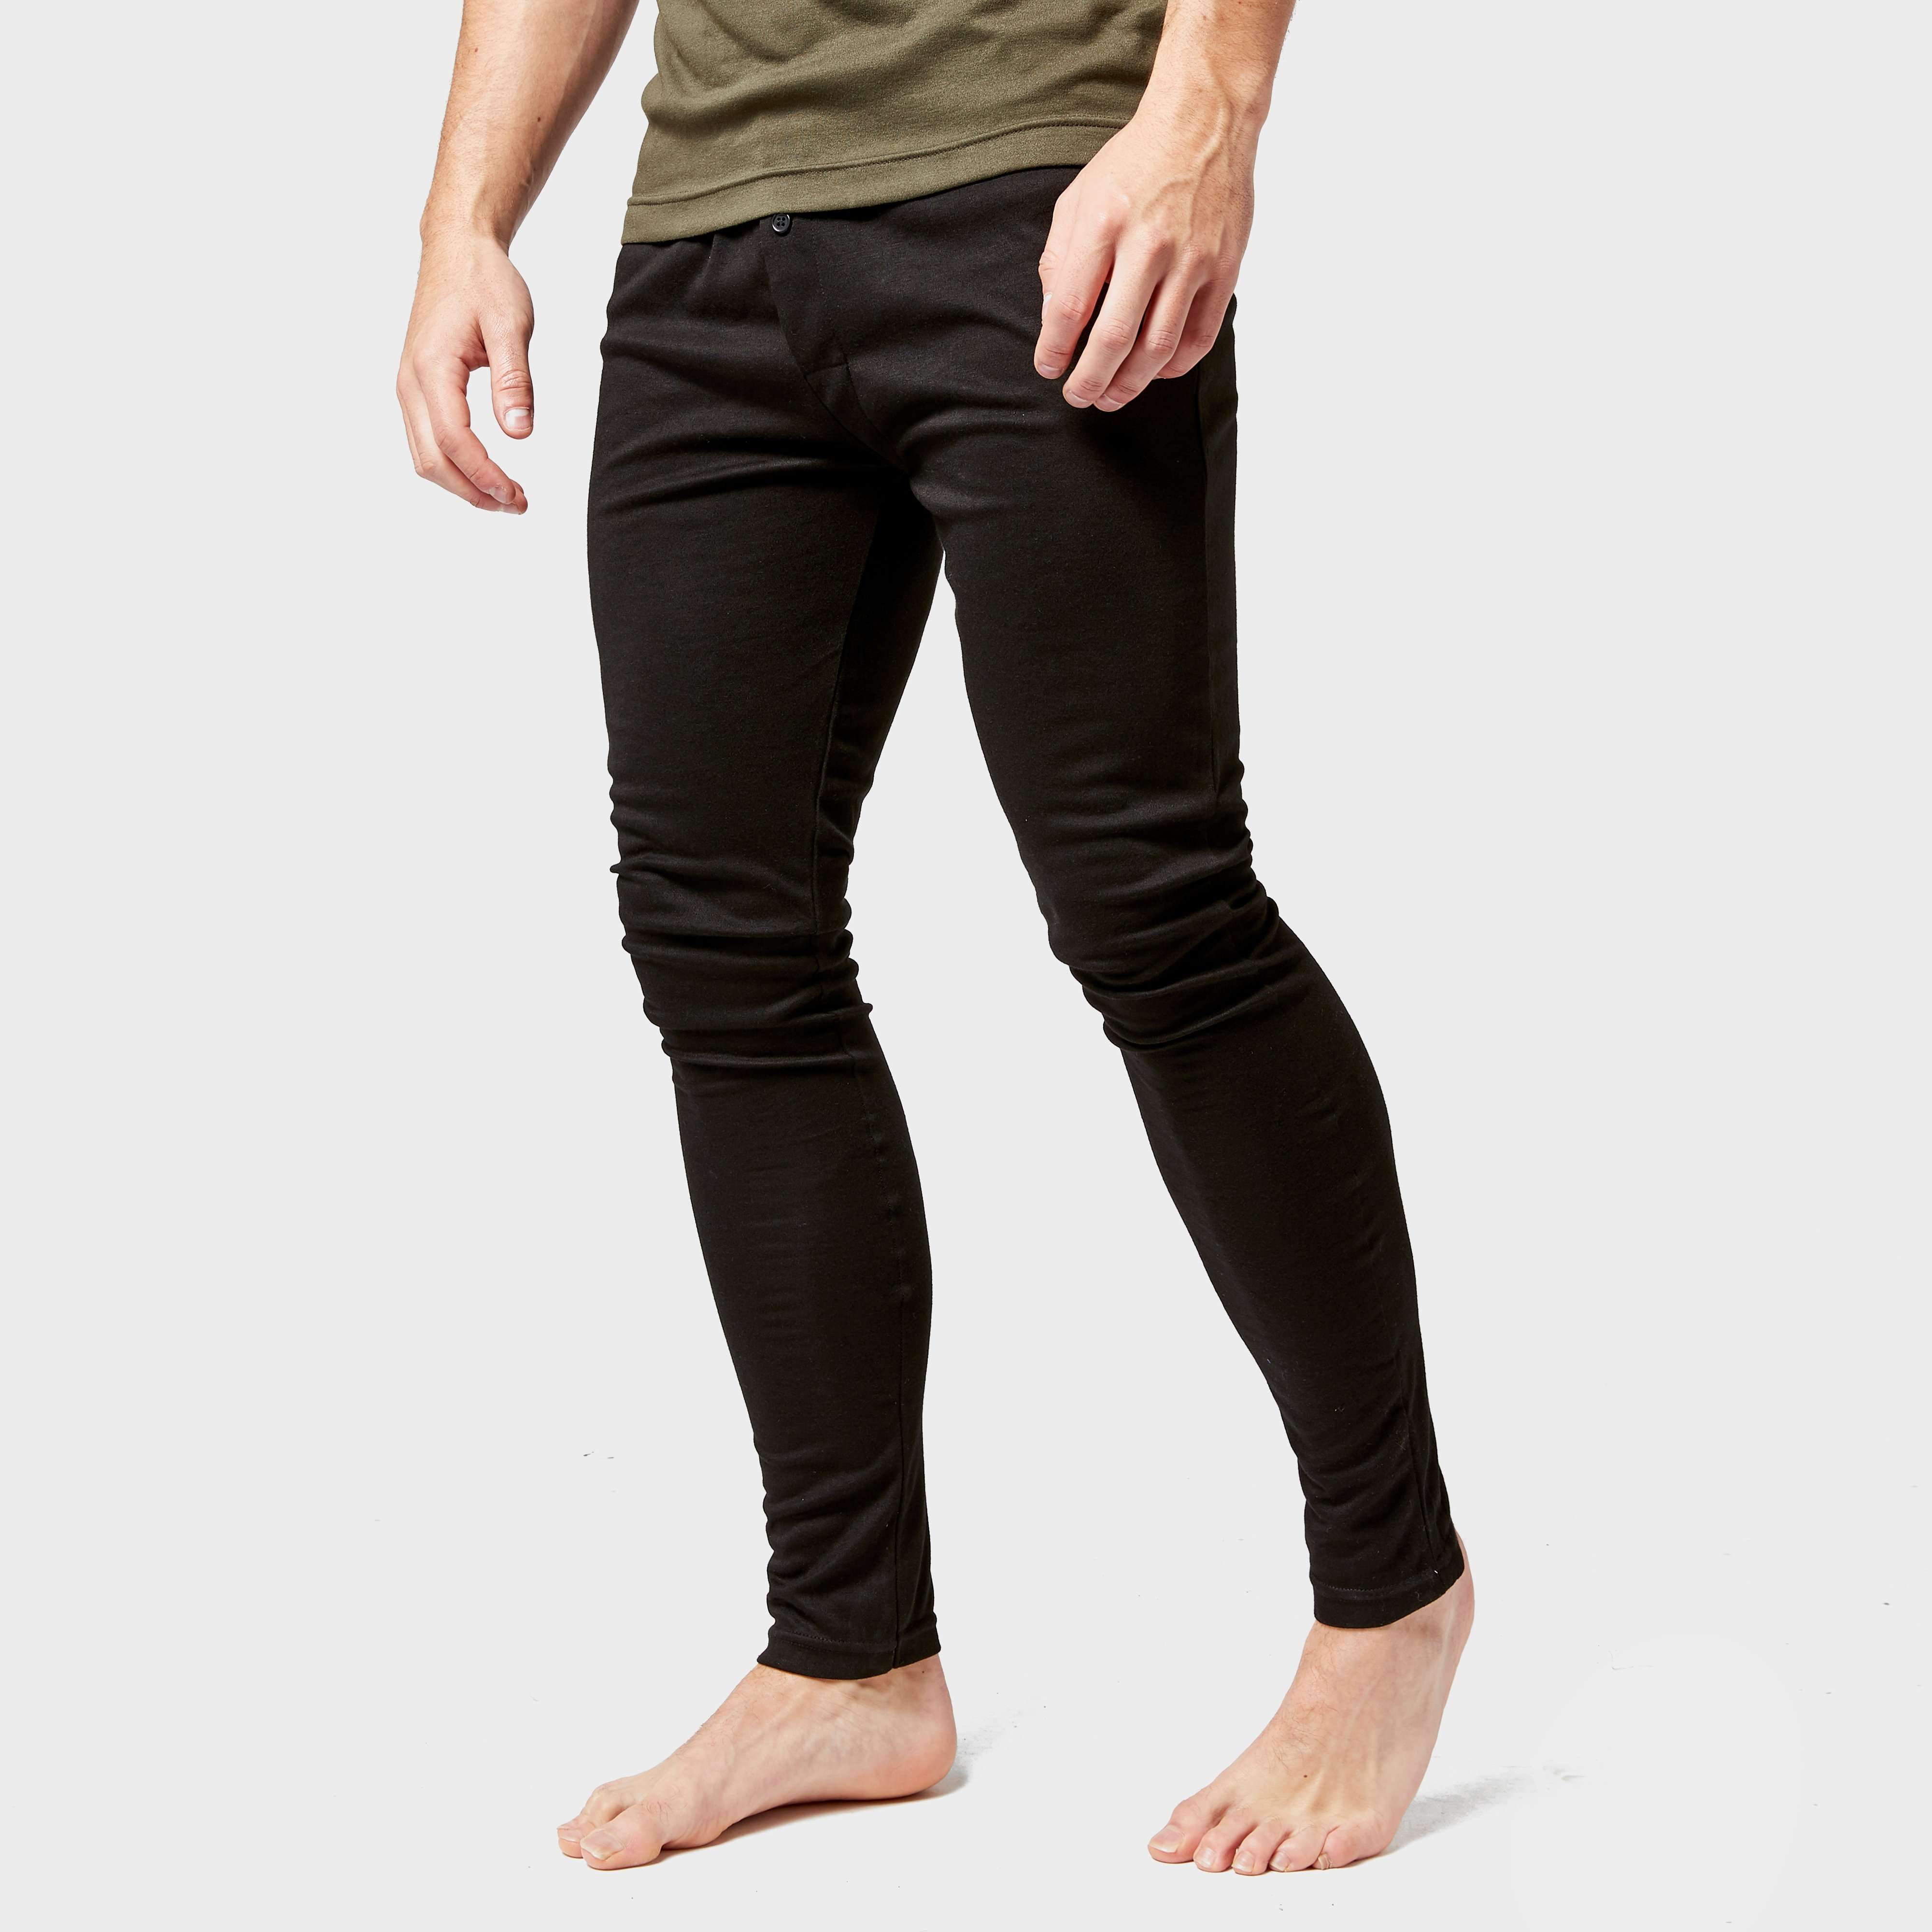 PETER STORM Men's Thermal Base Layer Pants